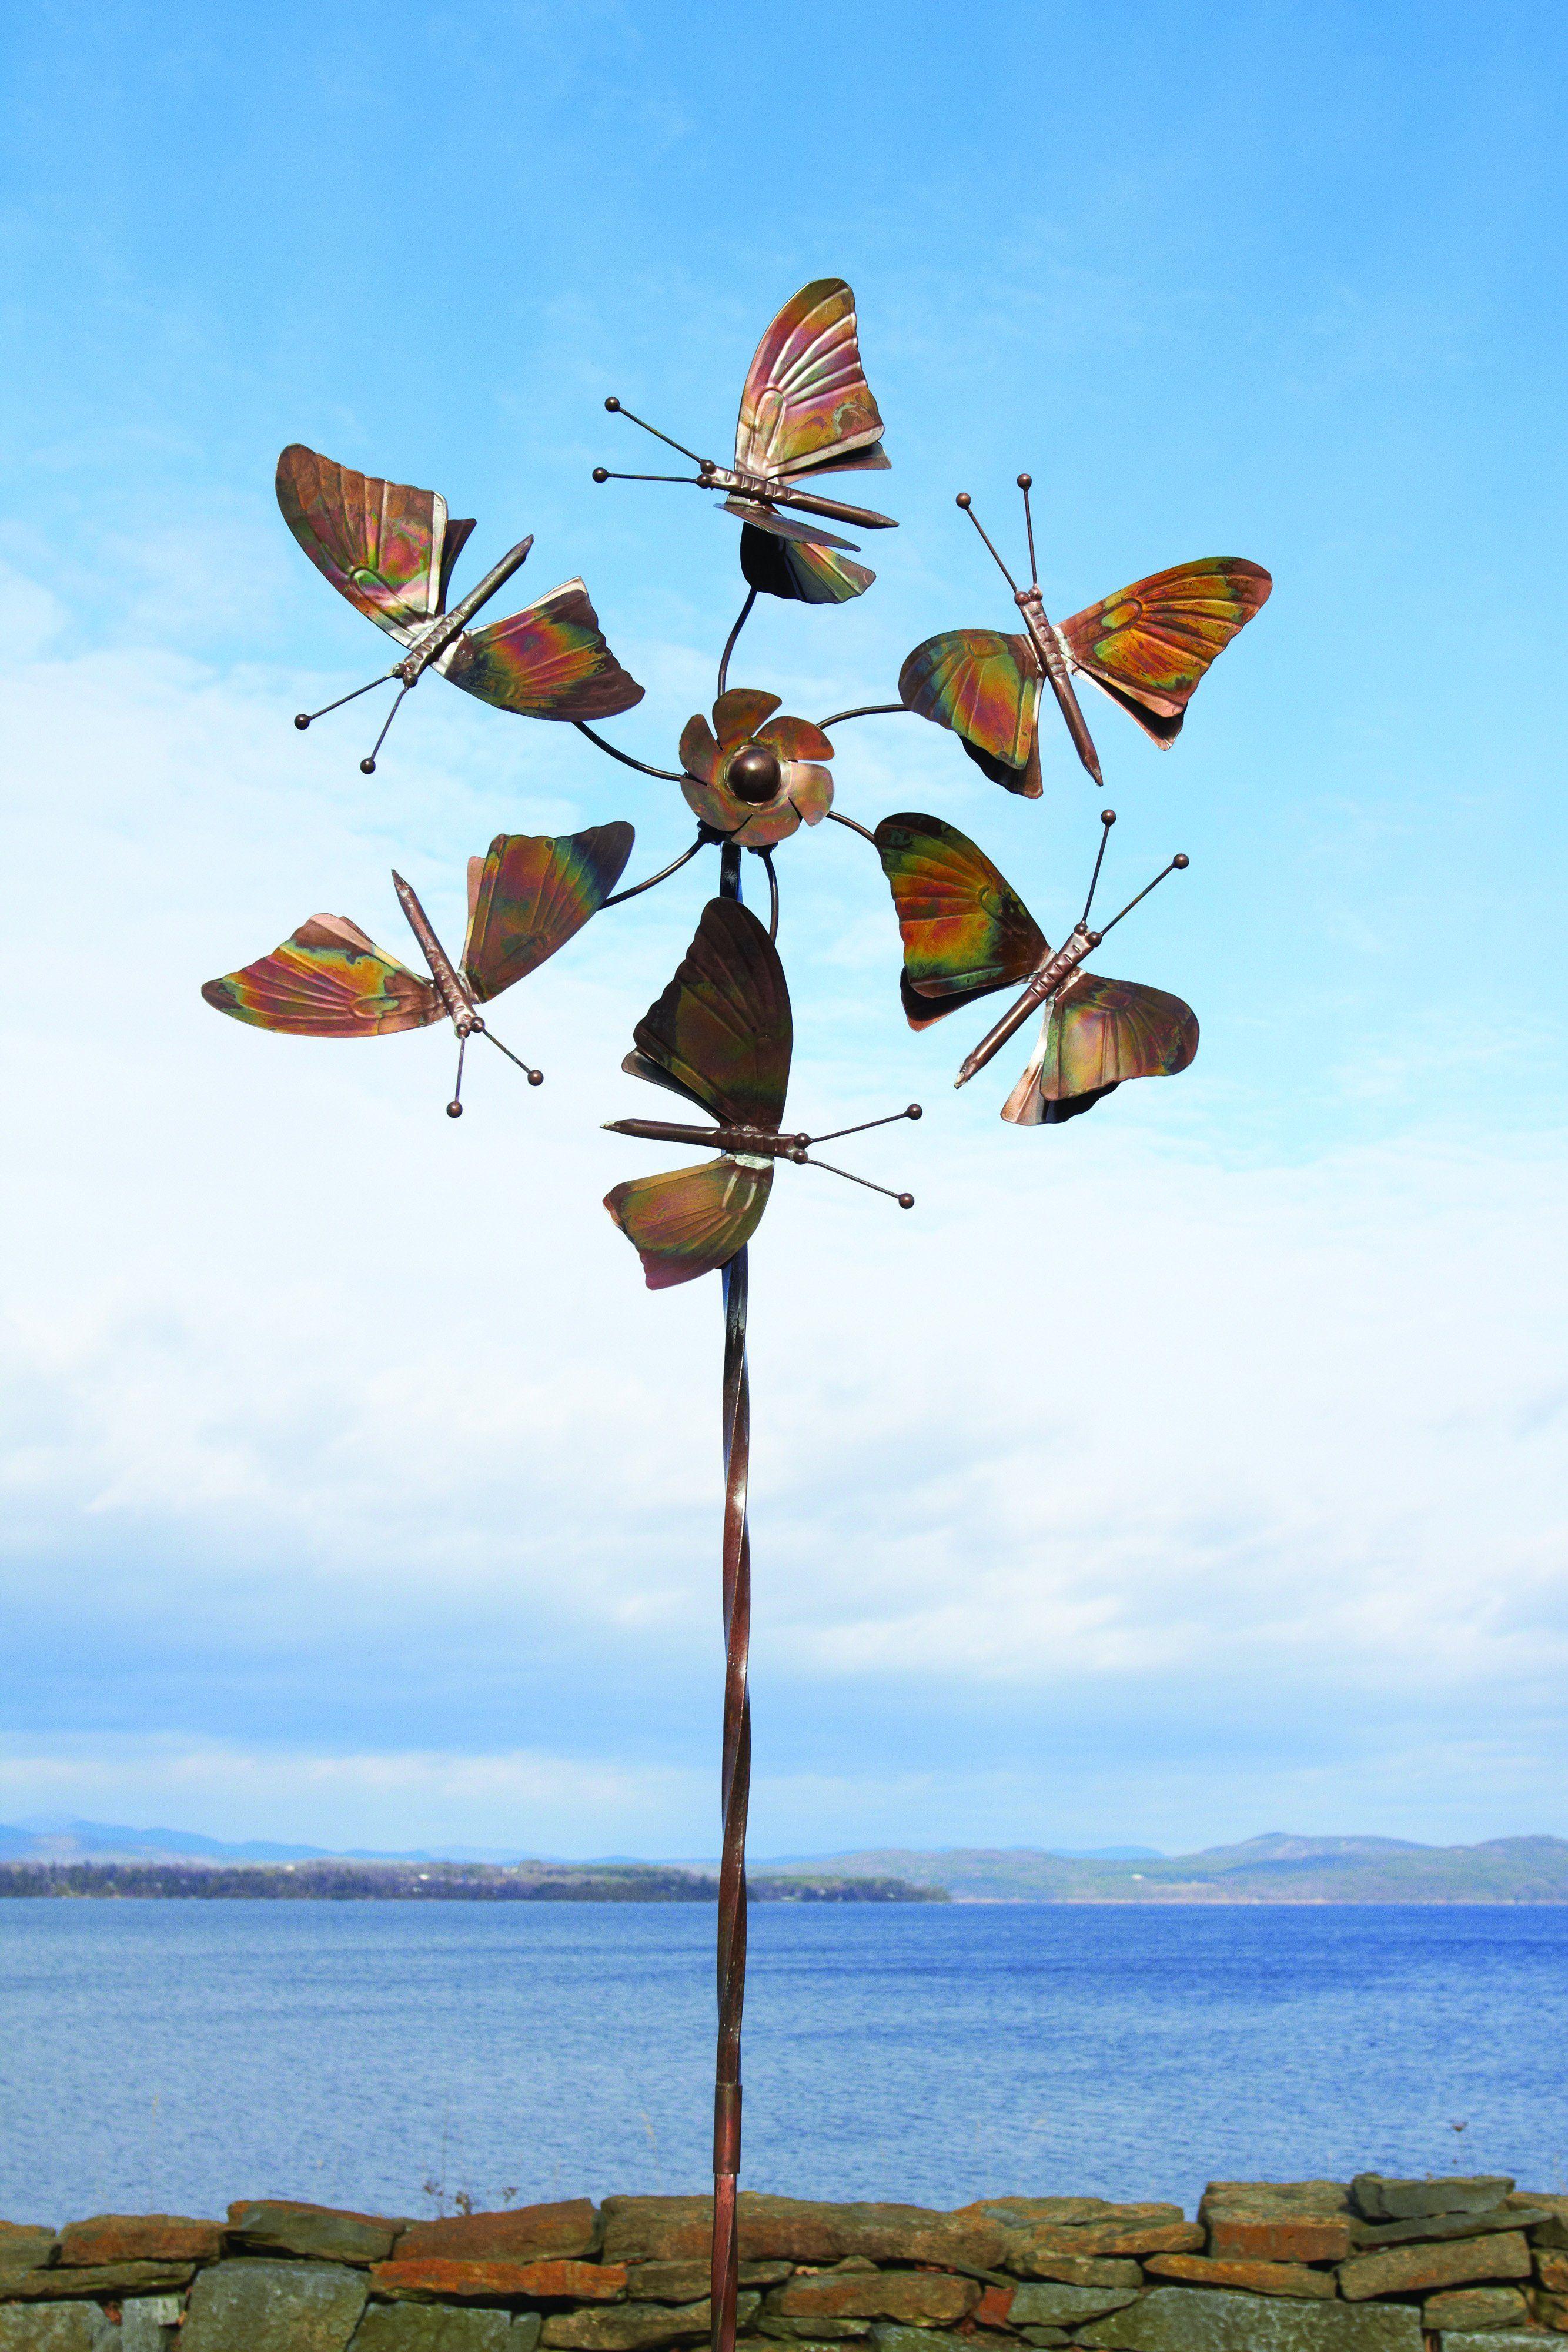 Flamed Erflies Spinner Garden Ornaments Lawn Wind Spinners Kinetic